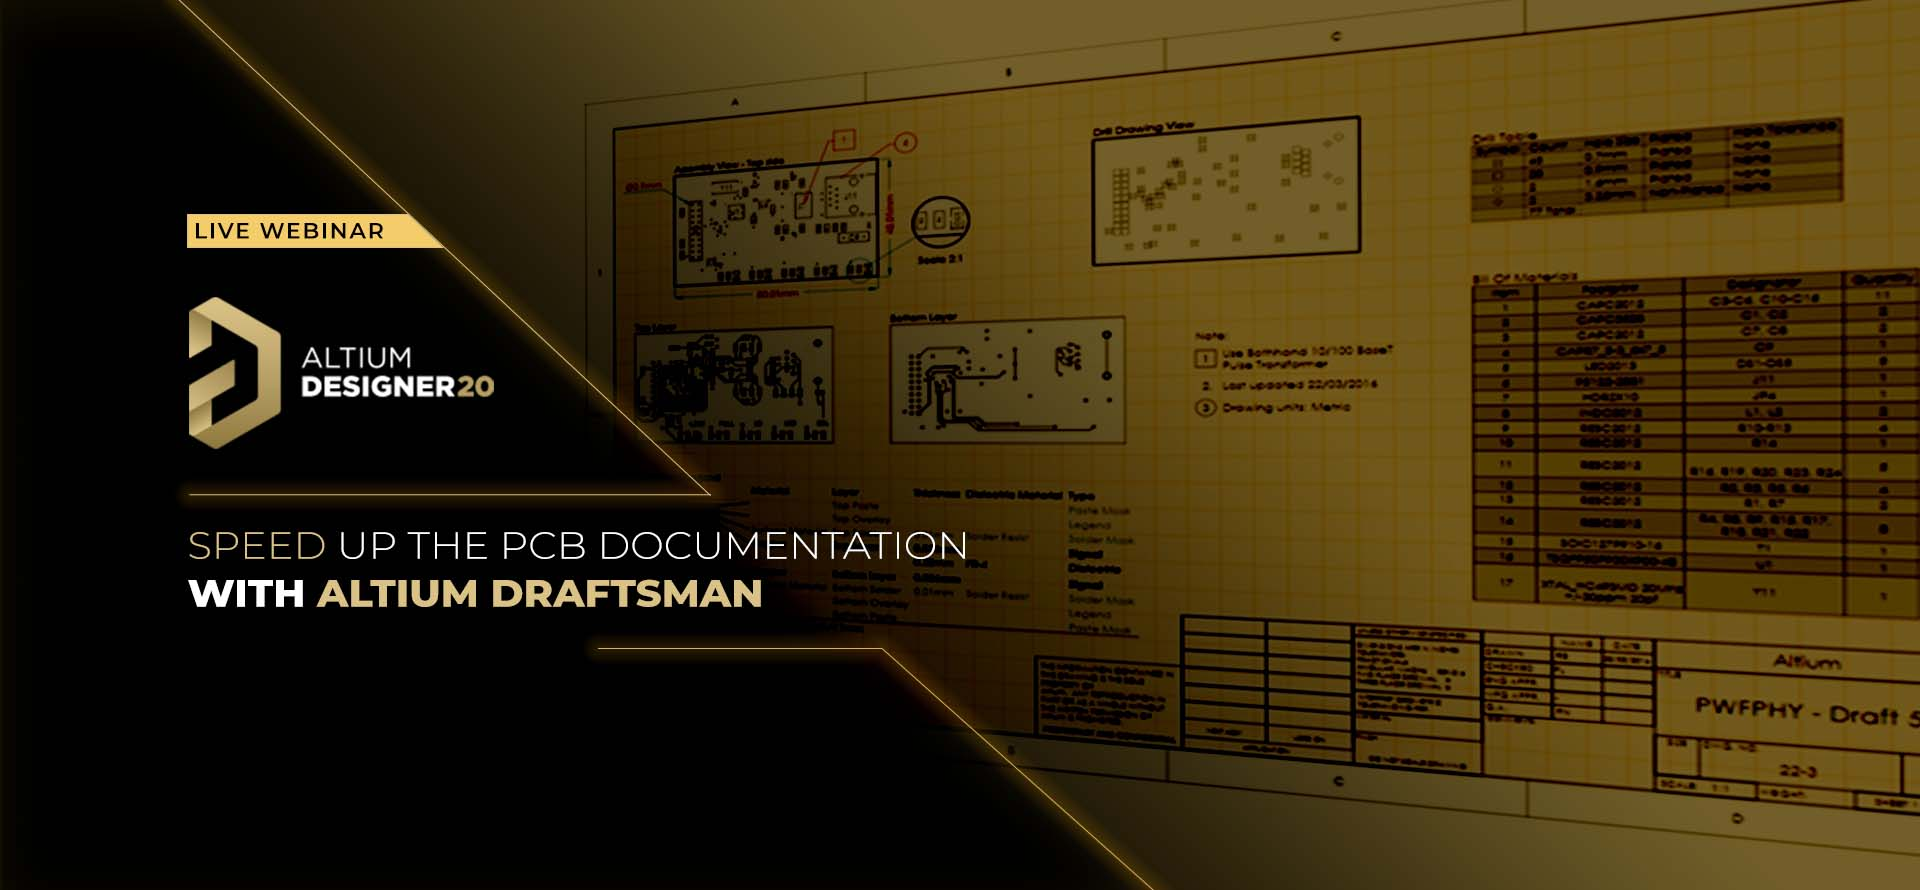 Speedup the PCB Documentation with Altium Draftsman